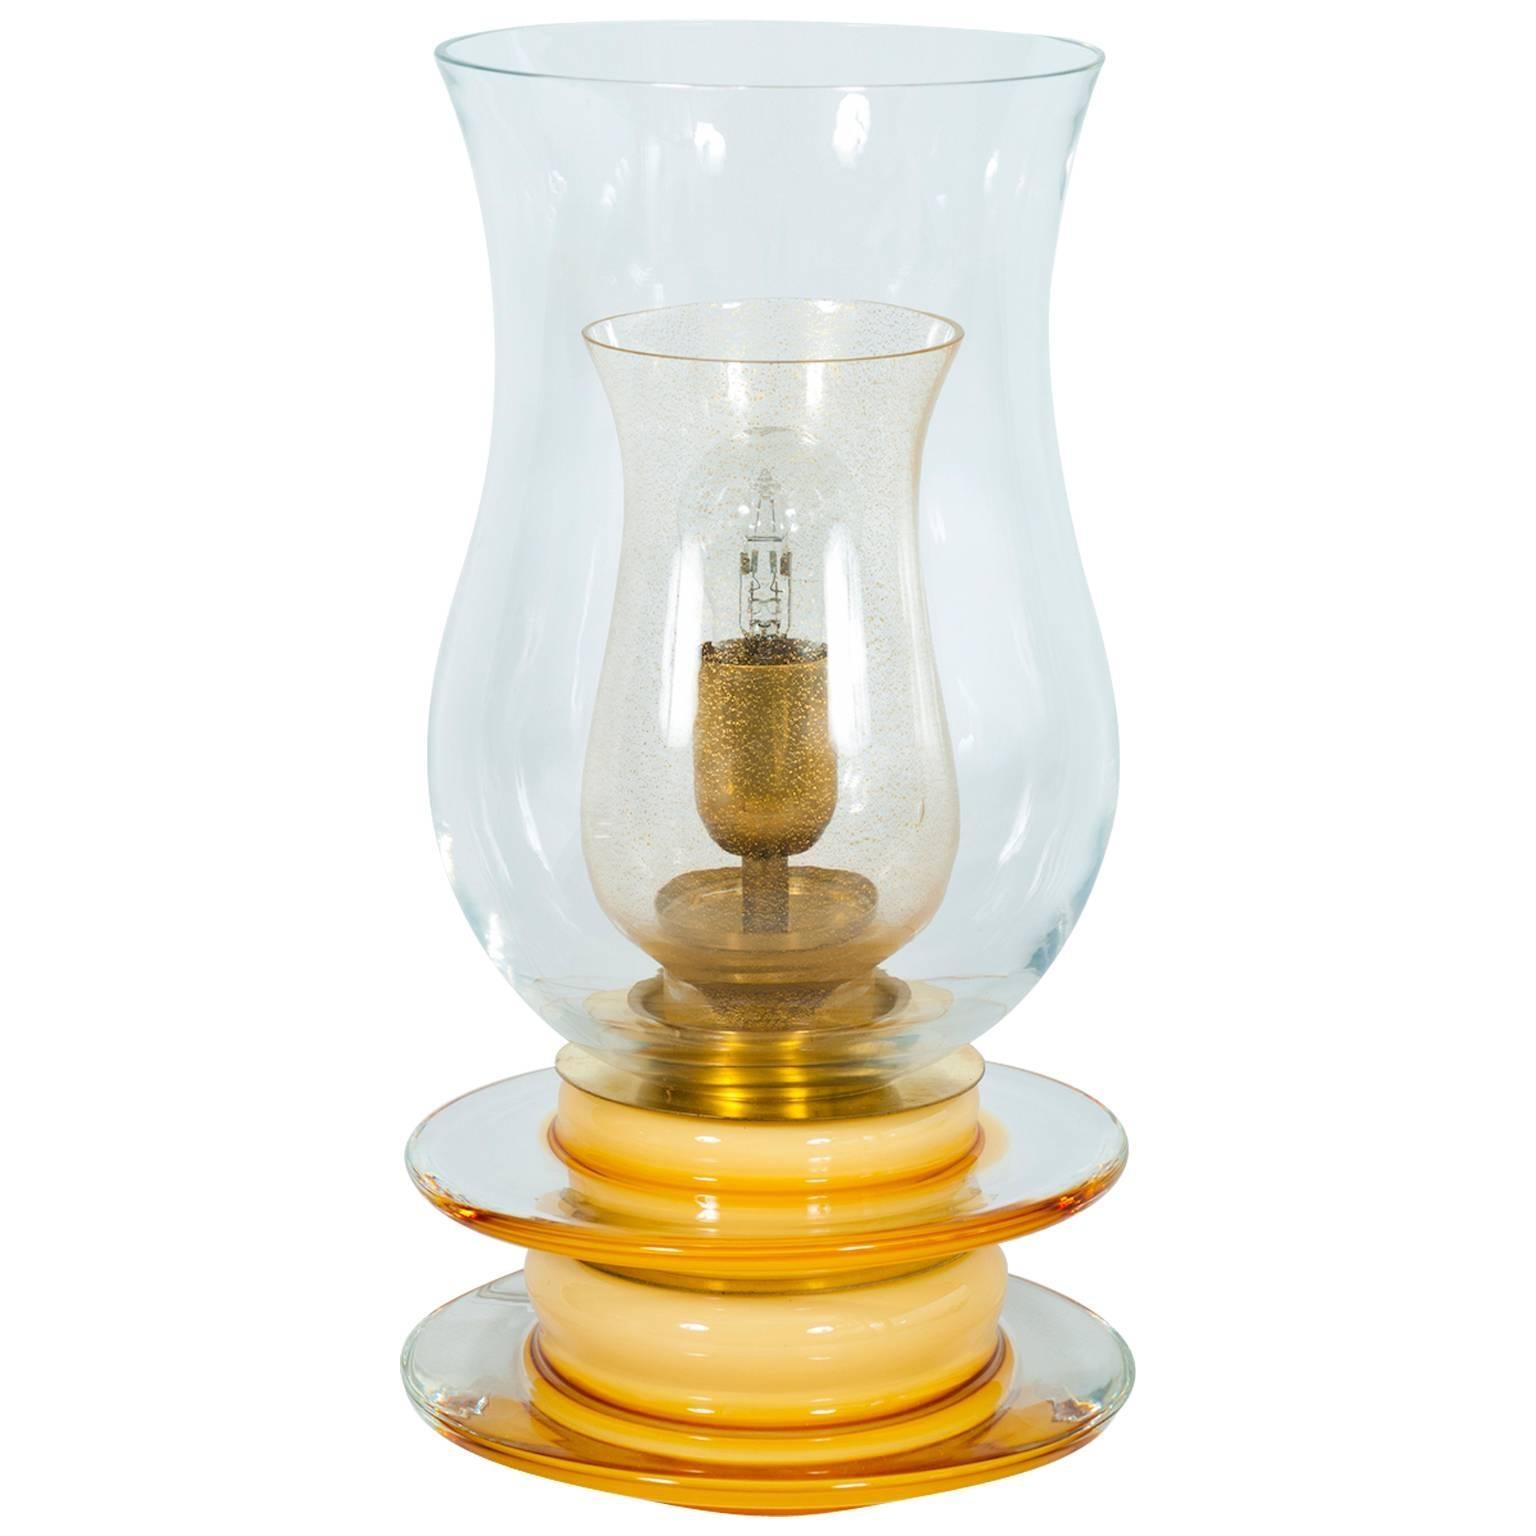 Italian Venetian, Table Lamp, Blown Murano Glass, Candle Shape,Gold Amber, 1970s